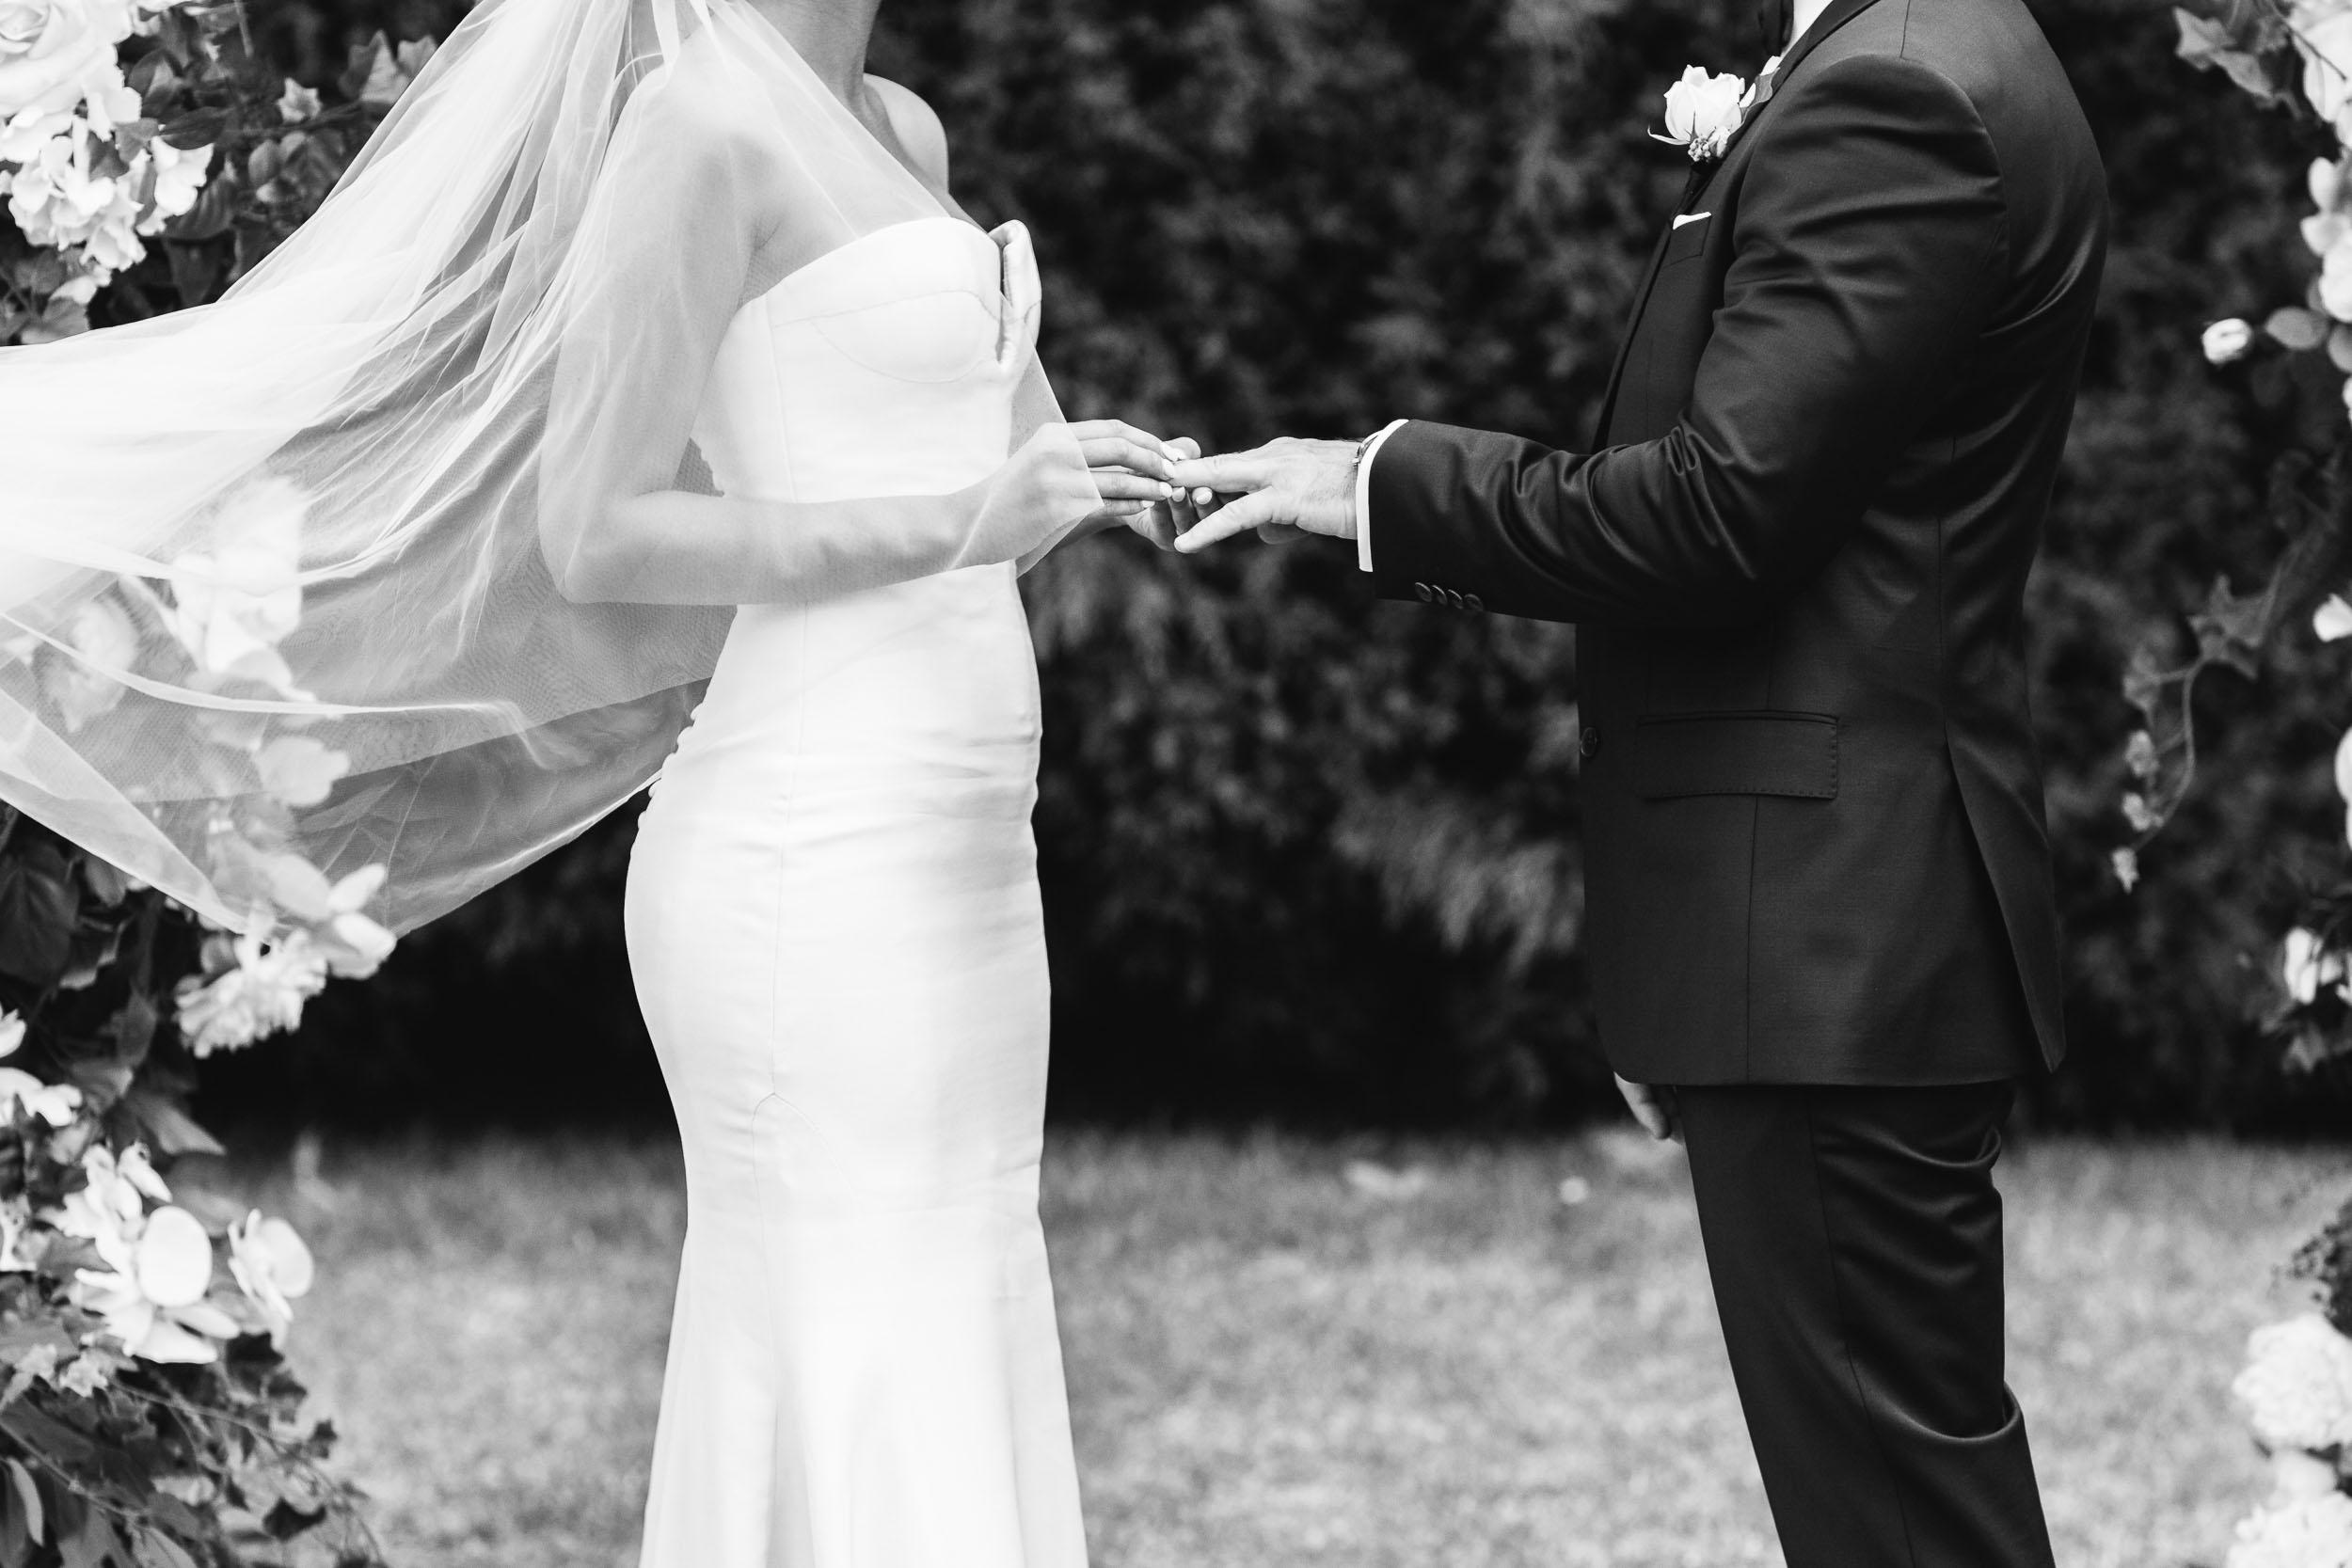 Kas-Richards-Melbourne-Garden-Wedding-Aerial-South-Whark-Georgia-Young-Couture-221.jpg